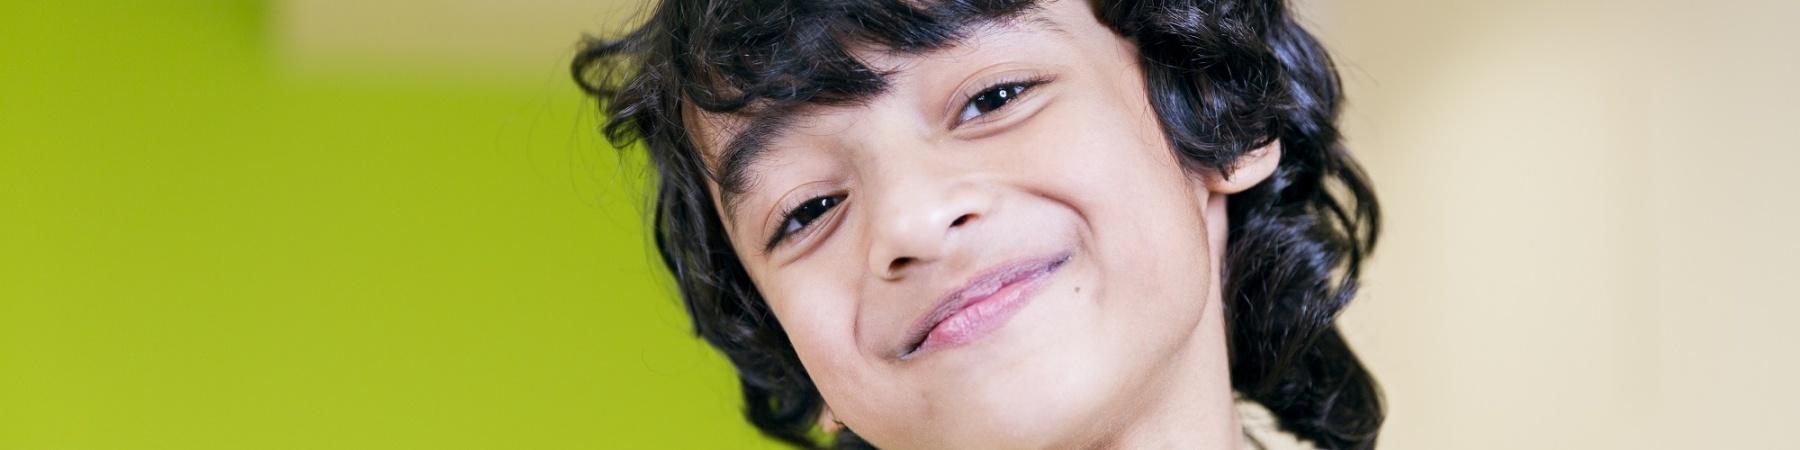 Bambino sorridente in primo piano